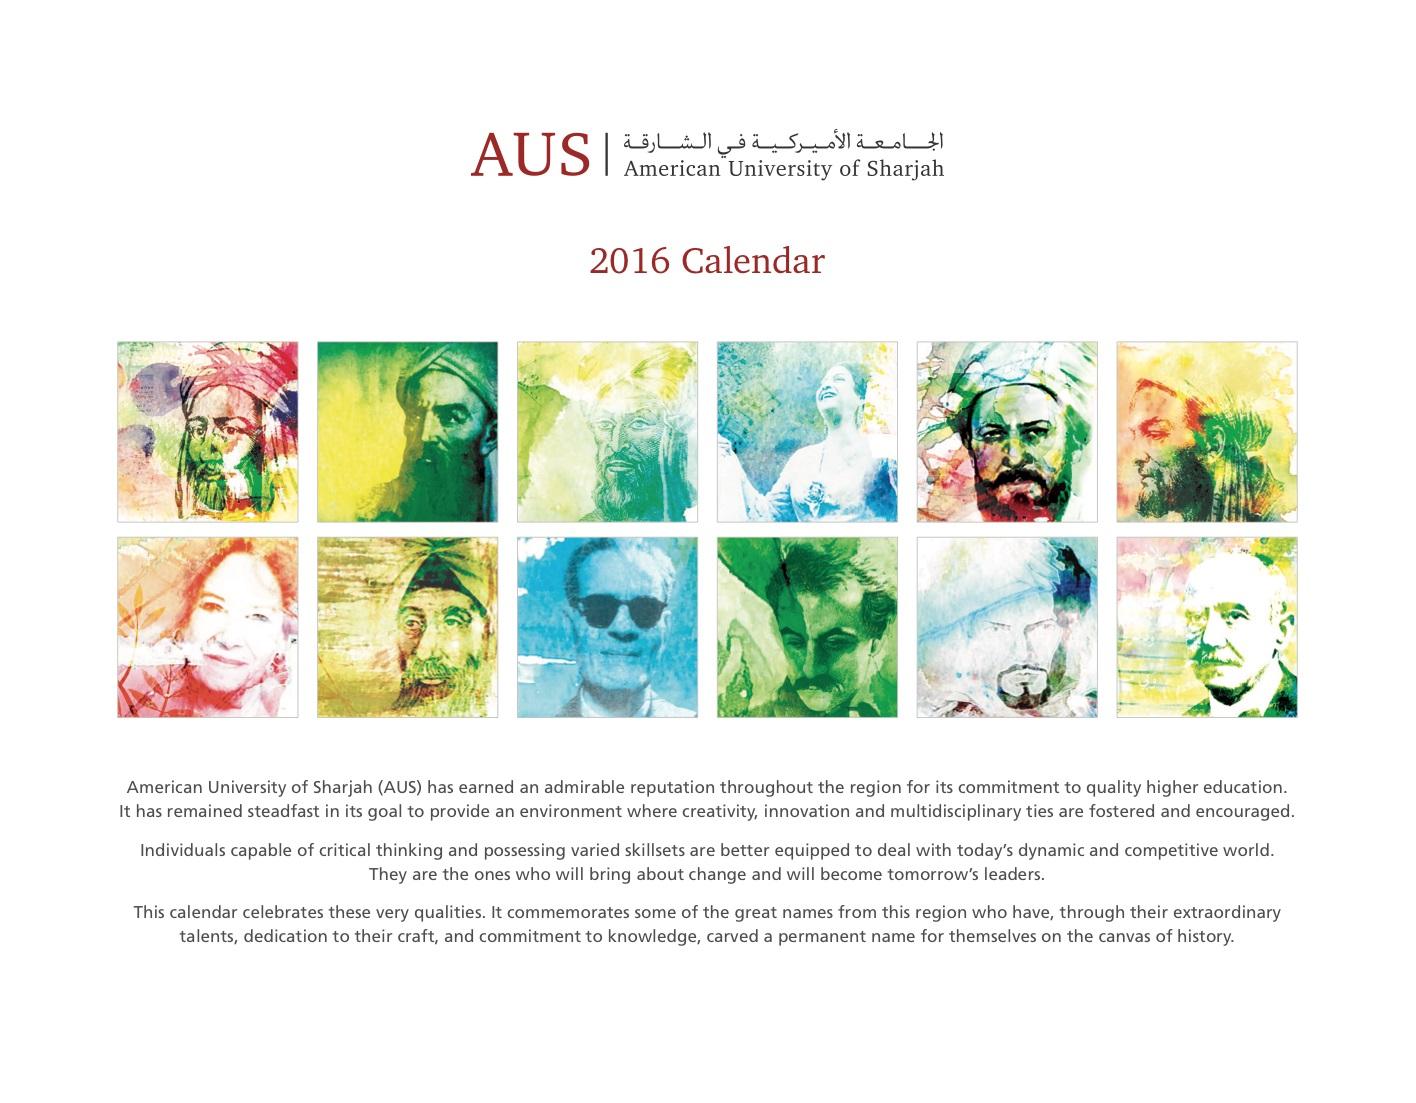 American_University_of_Sharjah_5-5.jpg